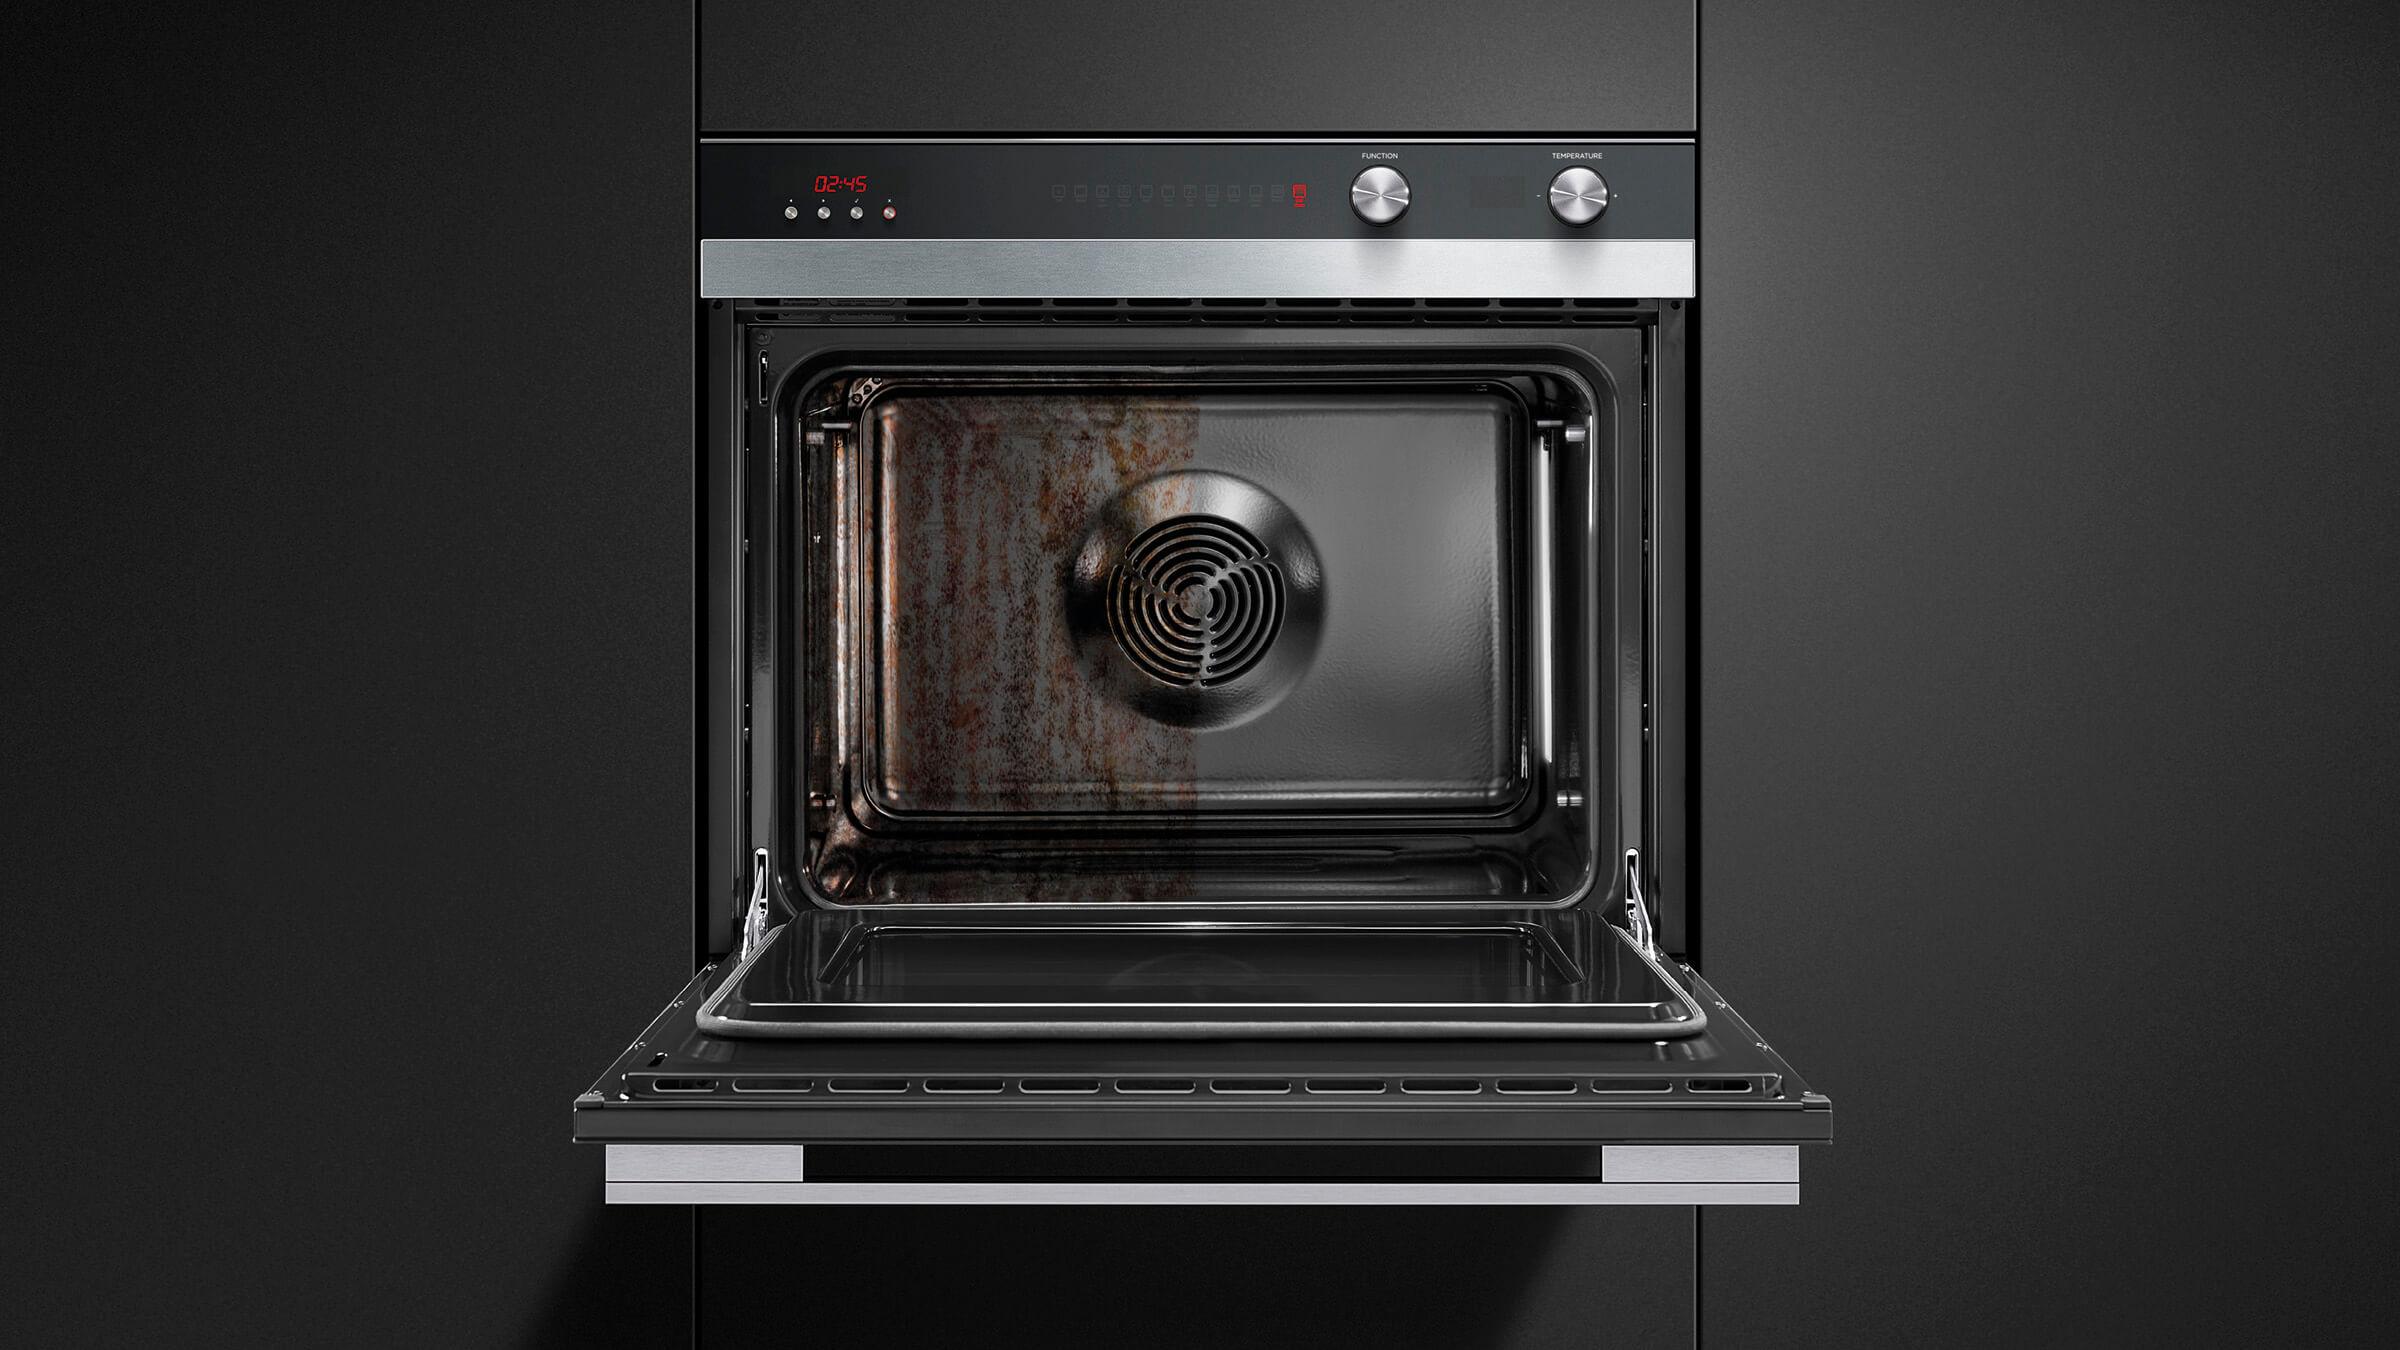 natural kitchen oven ventilation diagram wiring diagrams home ventilation  diagram natural kitchen oven ventilation diagram